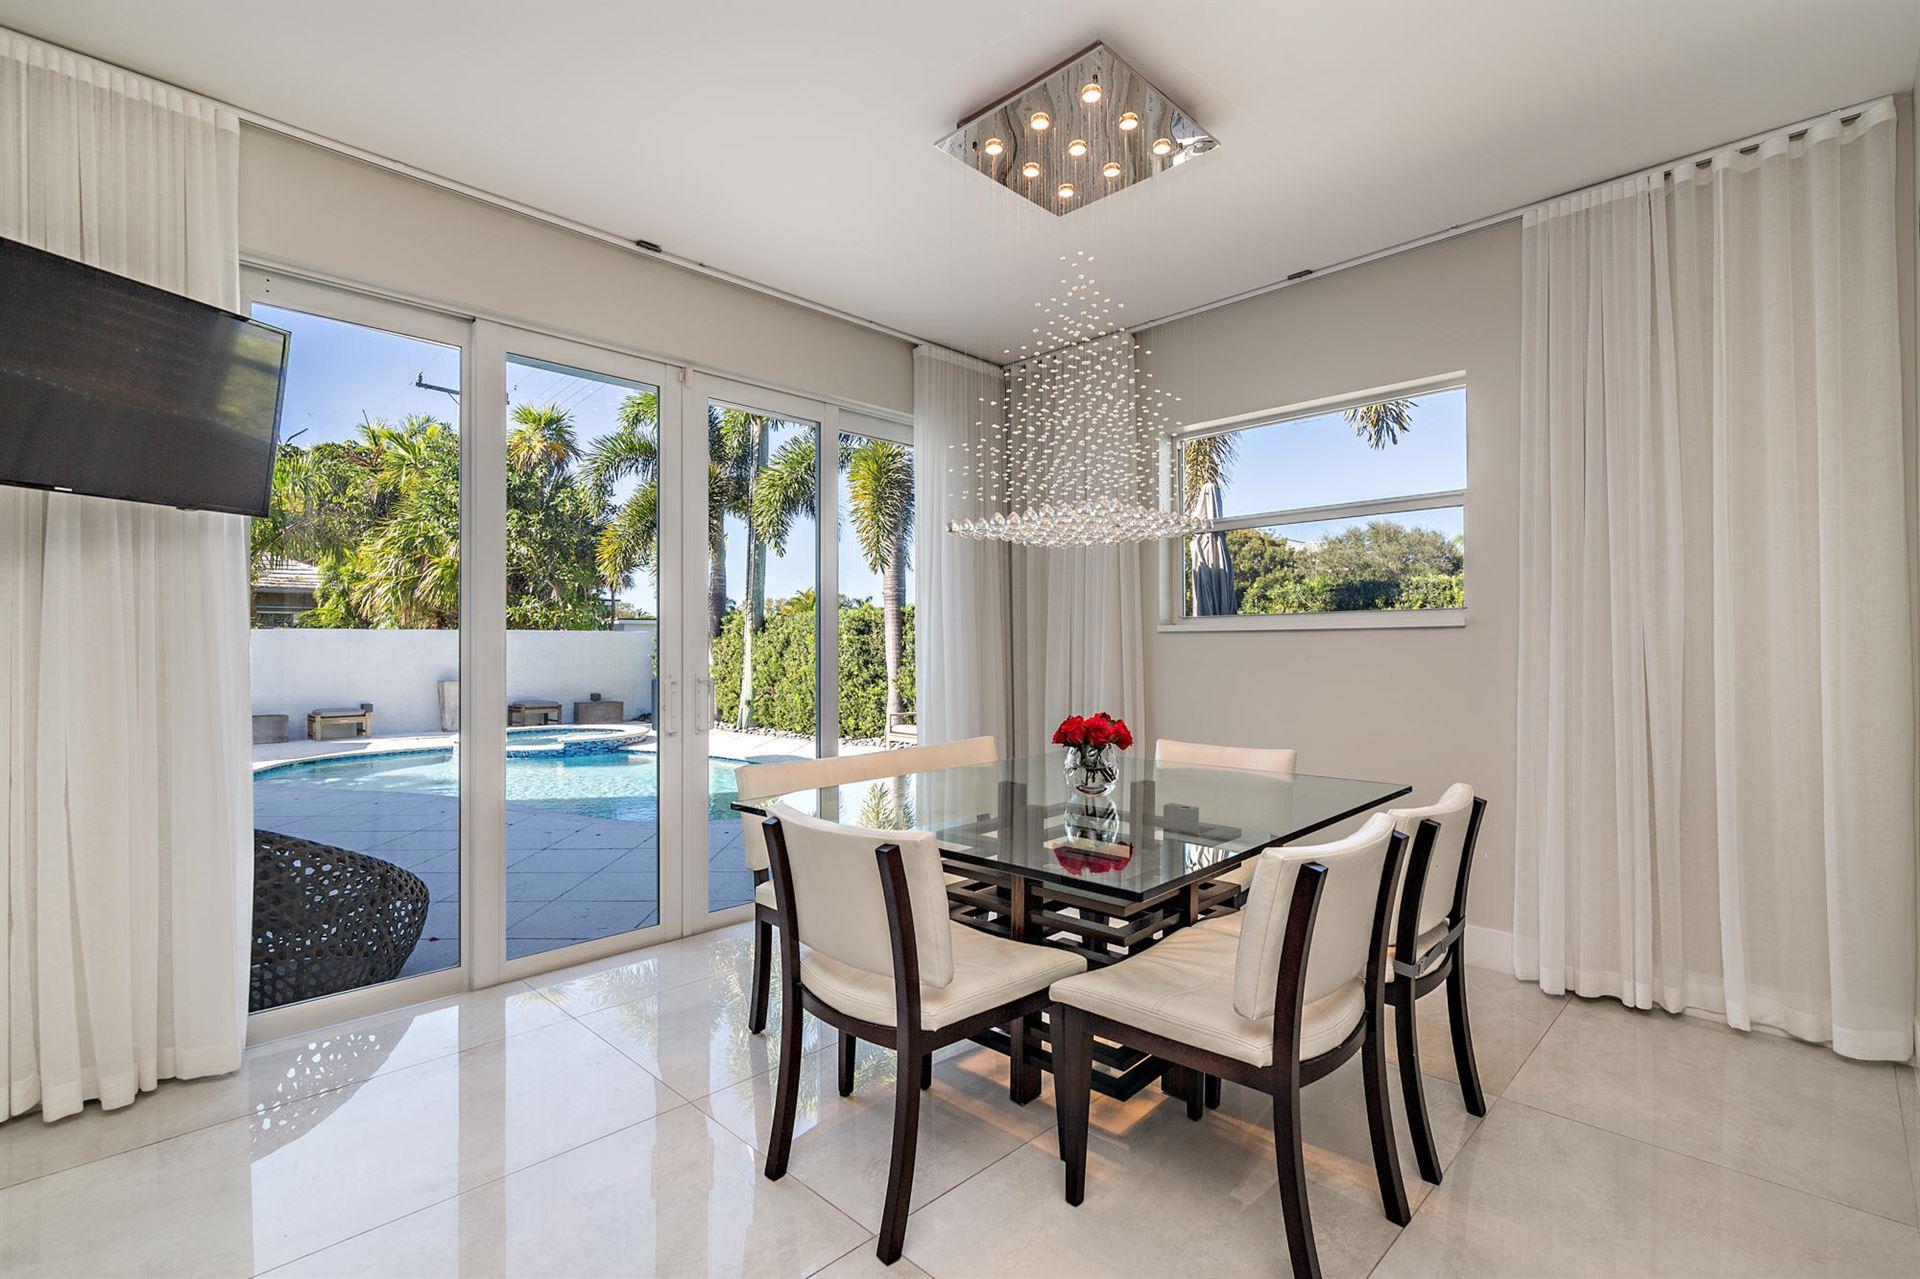 4515 Flagler, West Palm Beach, 33405 Photo 1